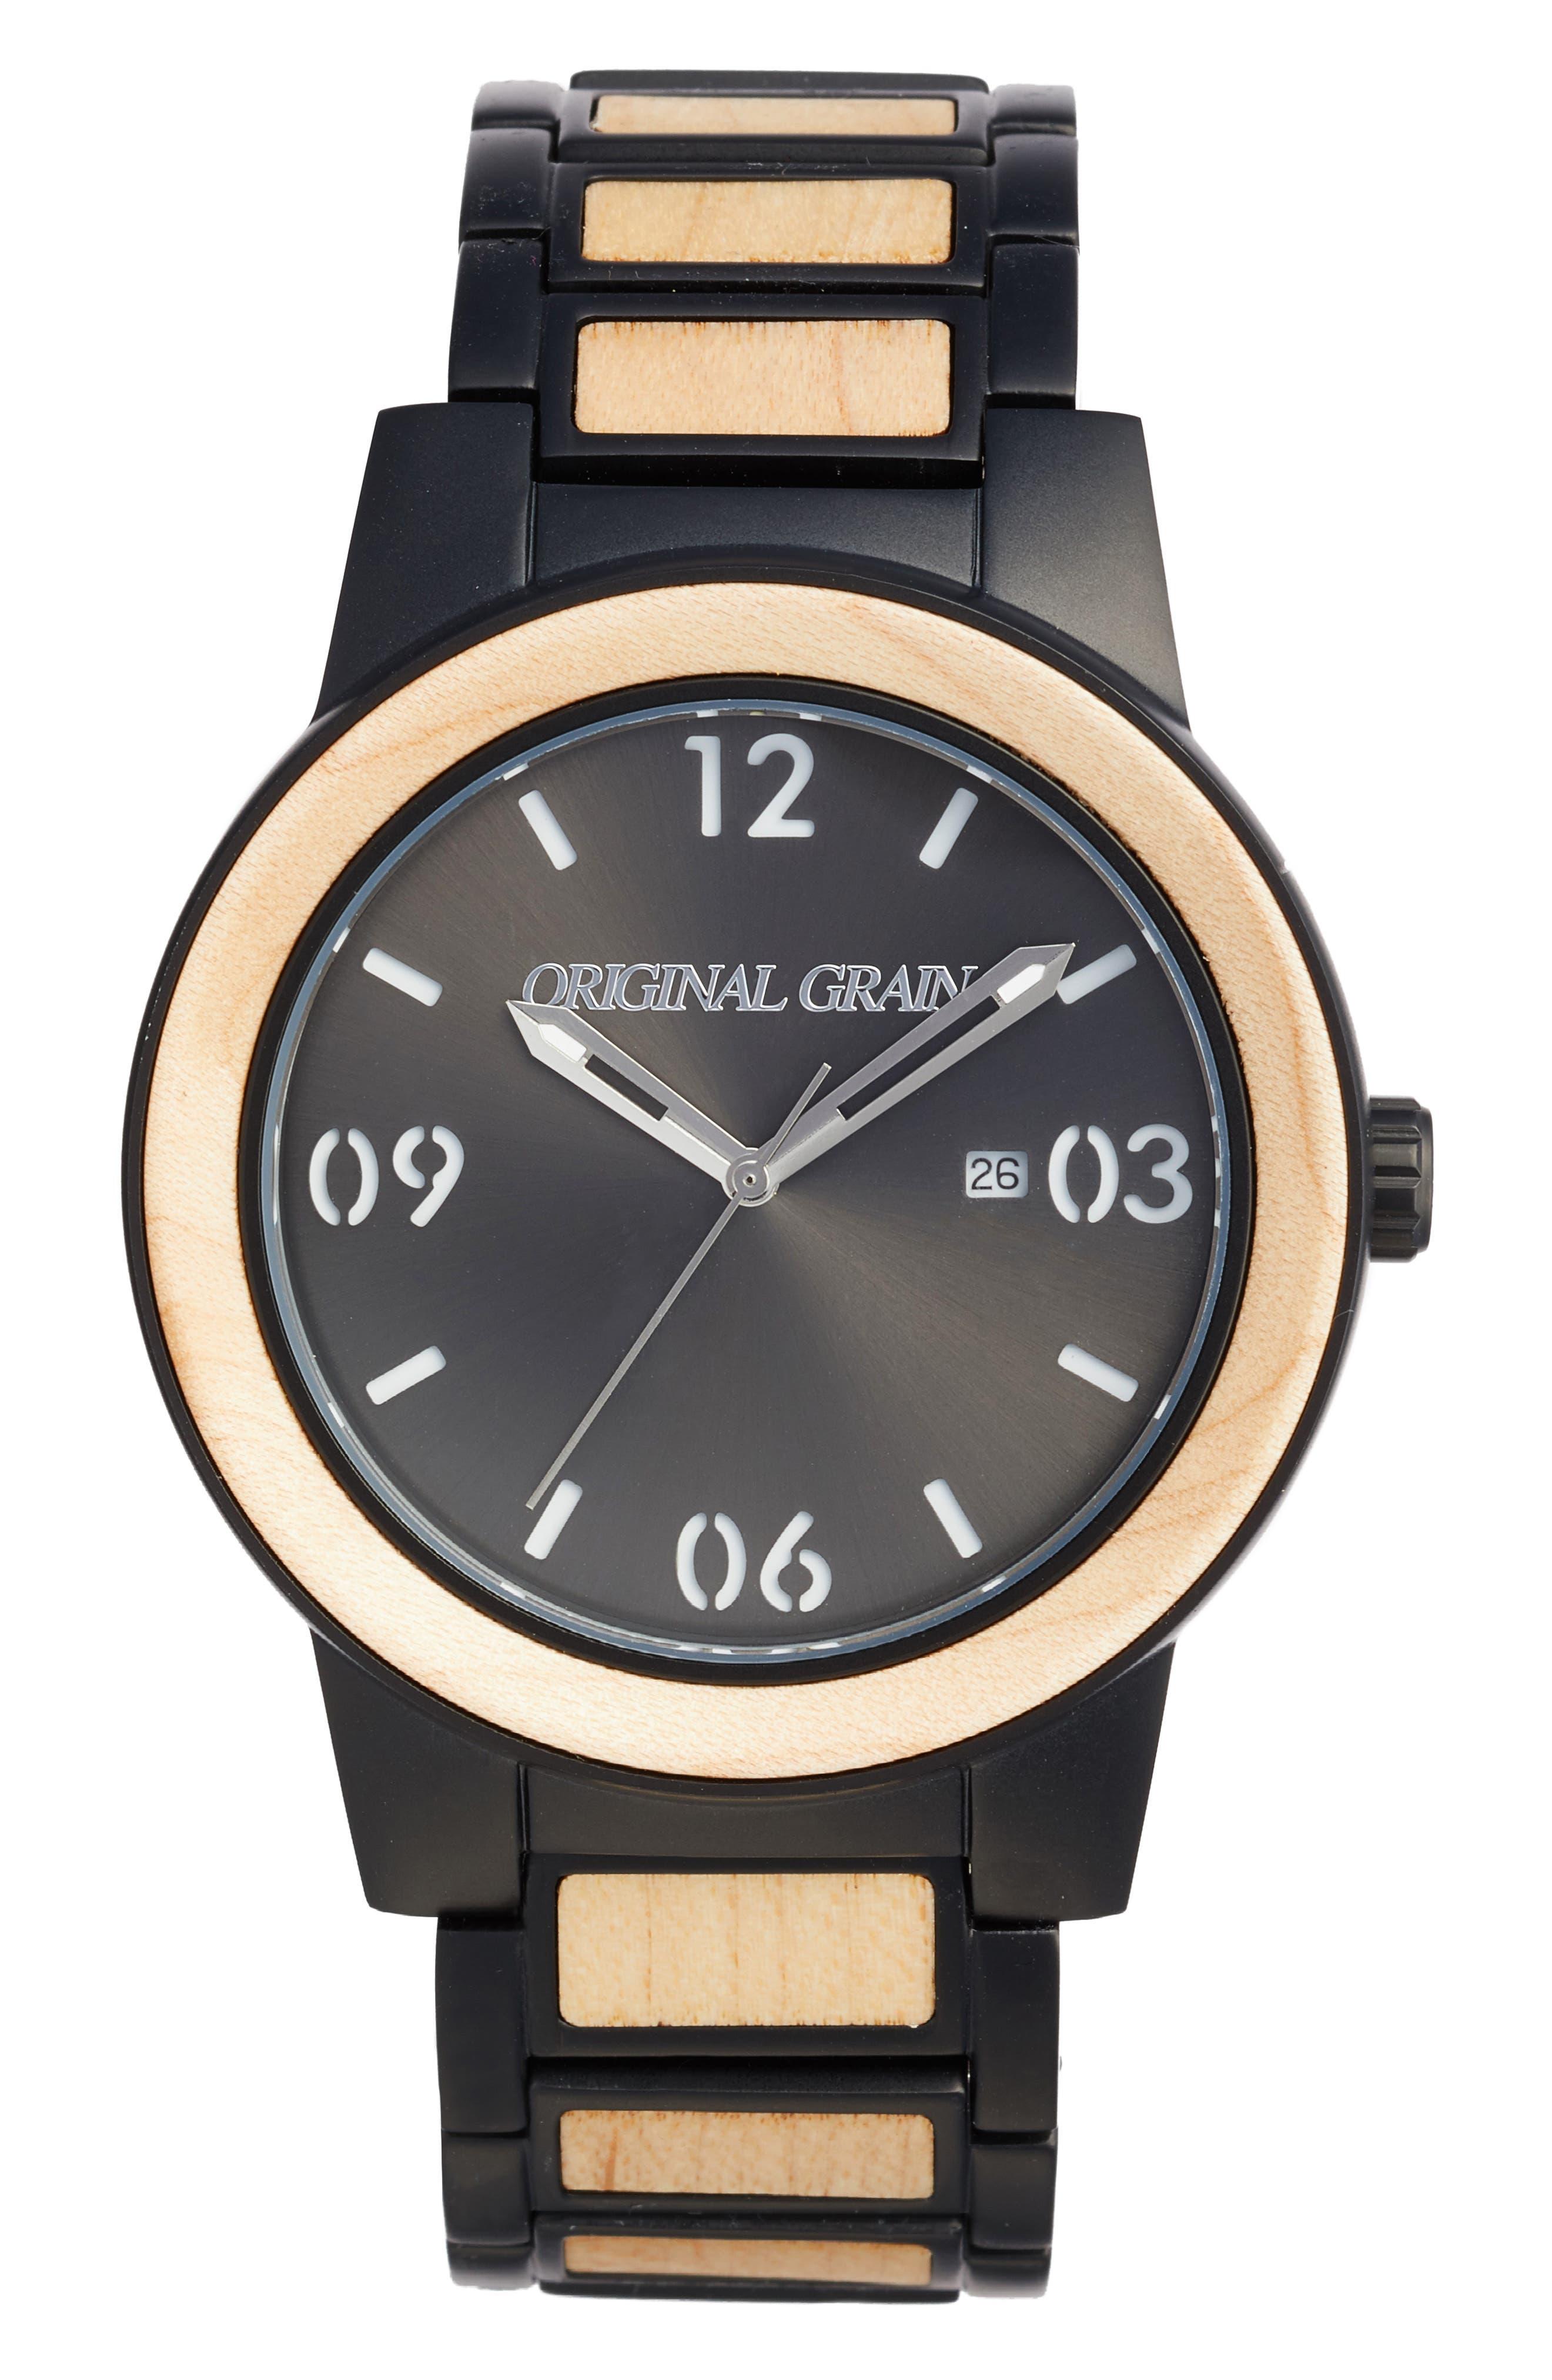 Main Image - Original Grain The Barrel Bracelet Watch, 47mm